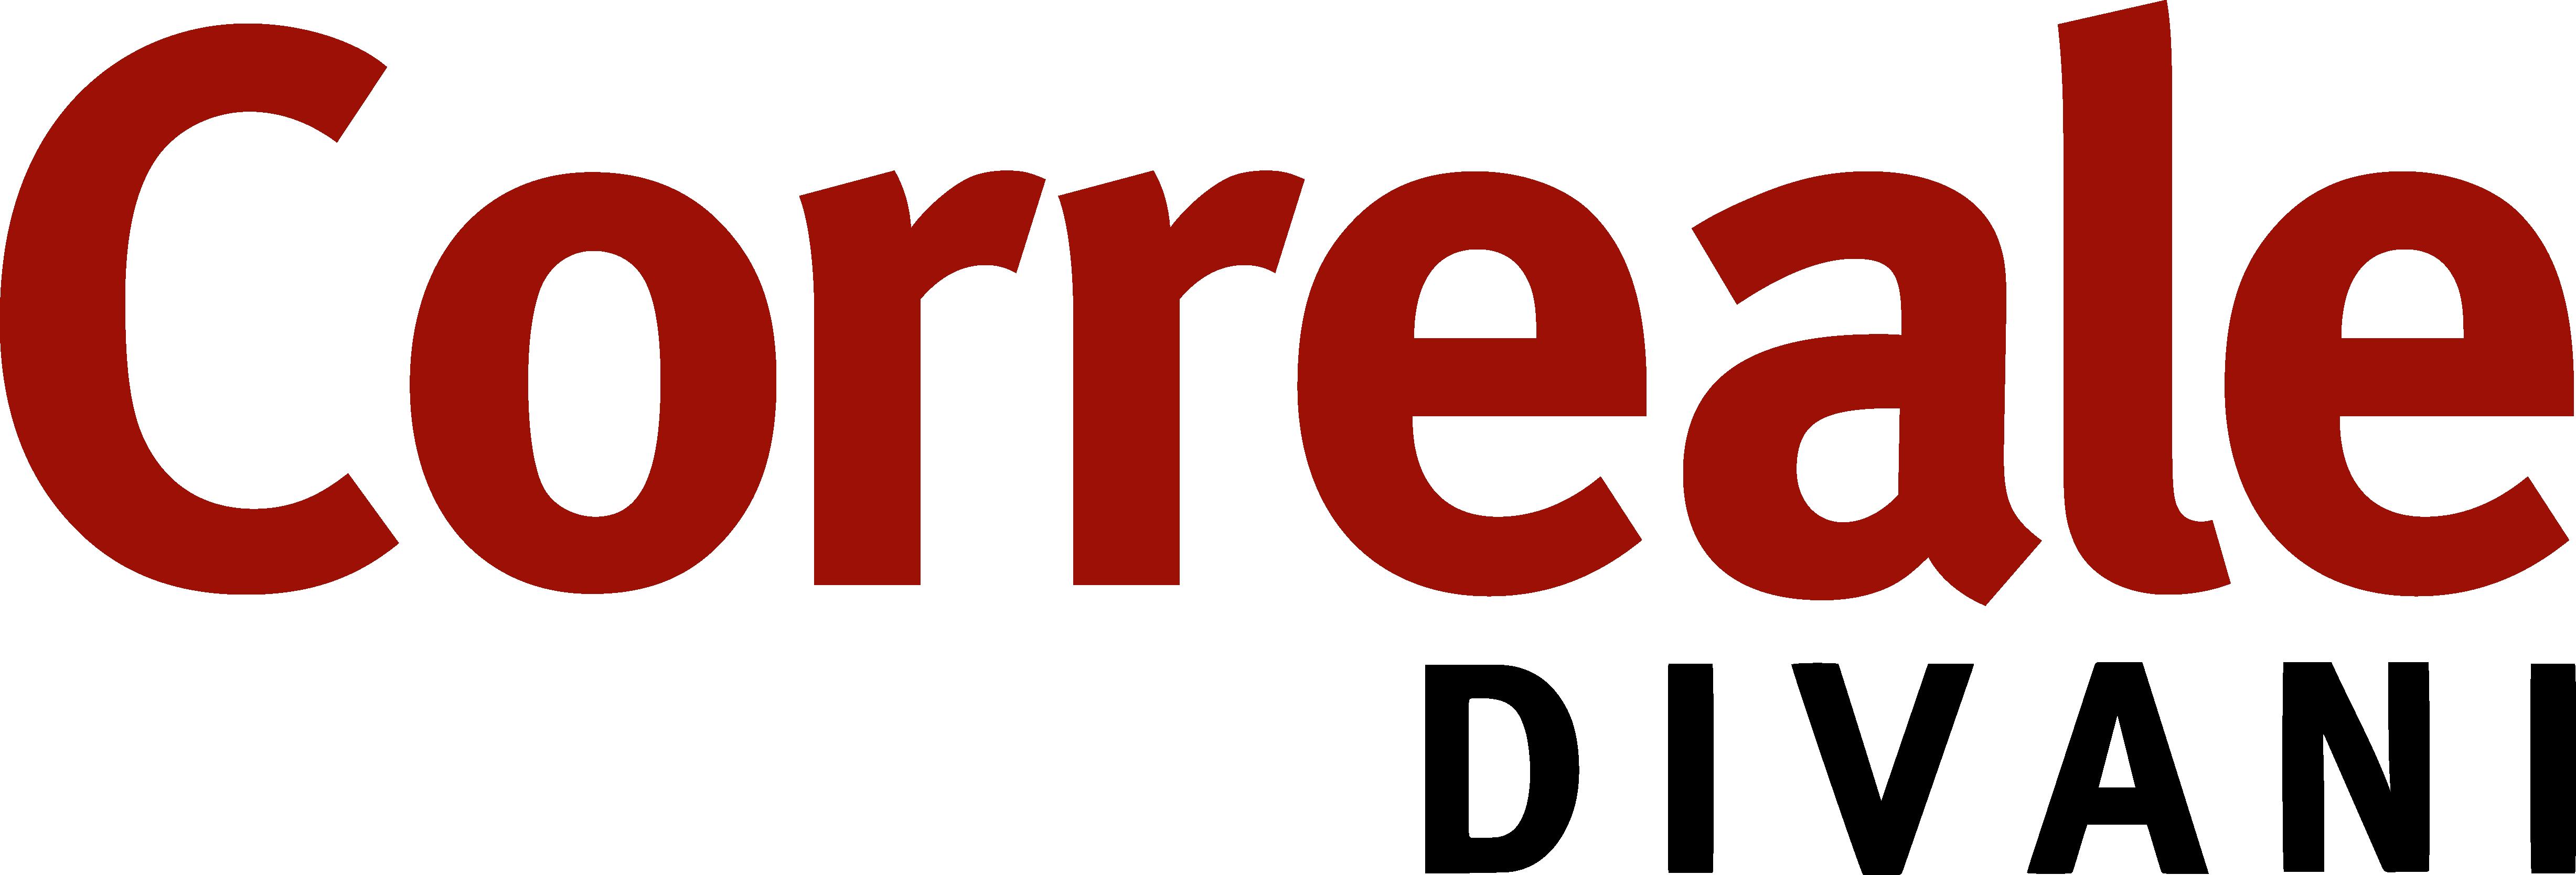 correale divani logo